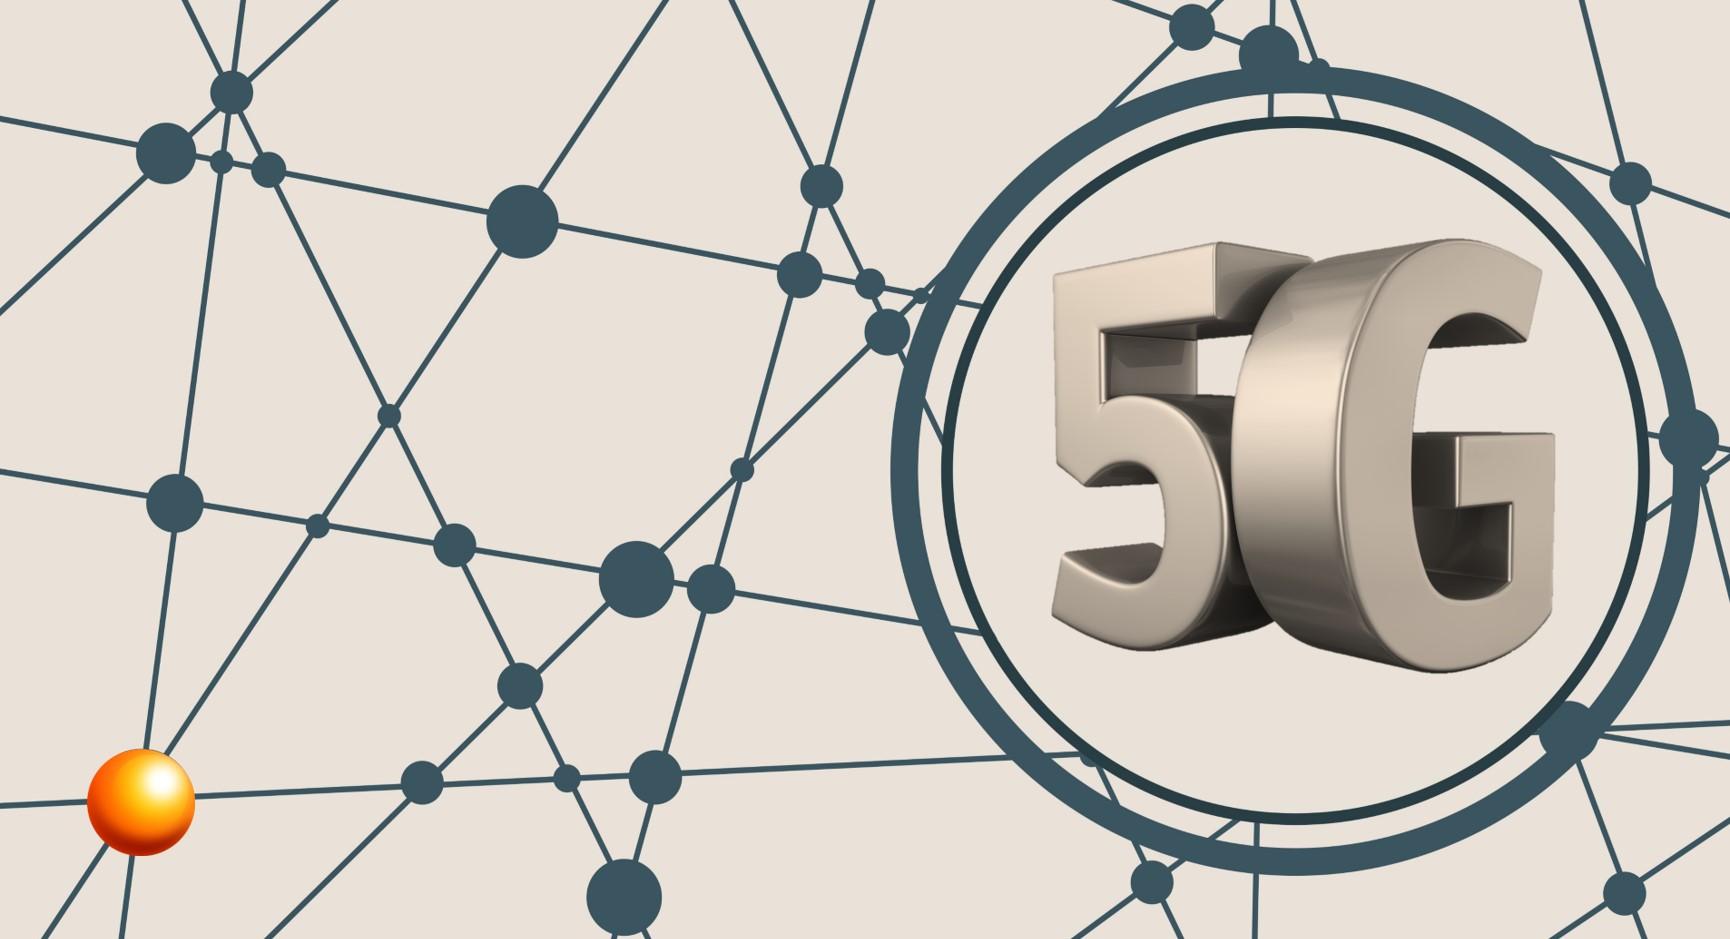 5G-nfv-automation-1